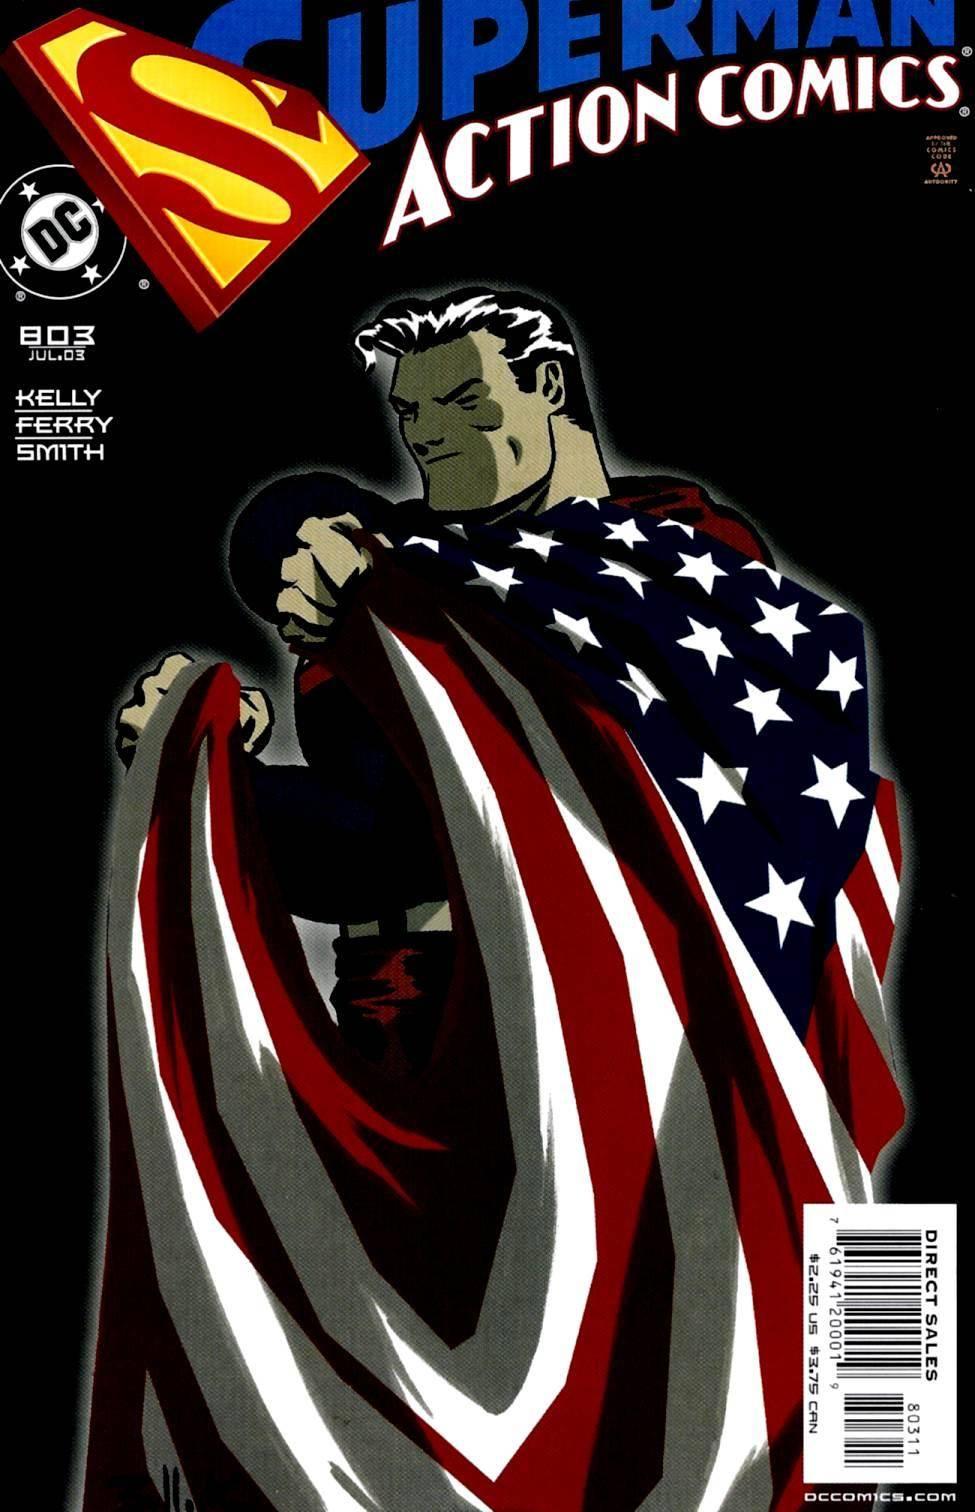 For Whomever - Action Comics 803 cbr